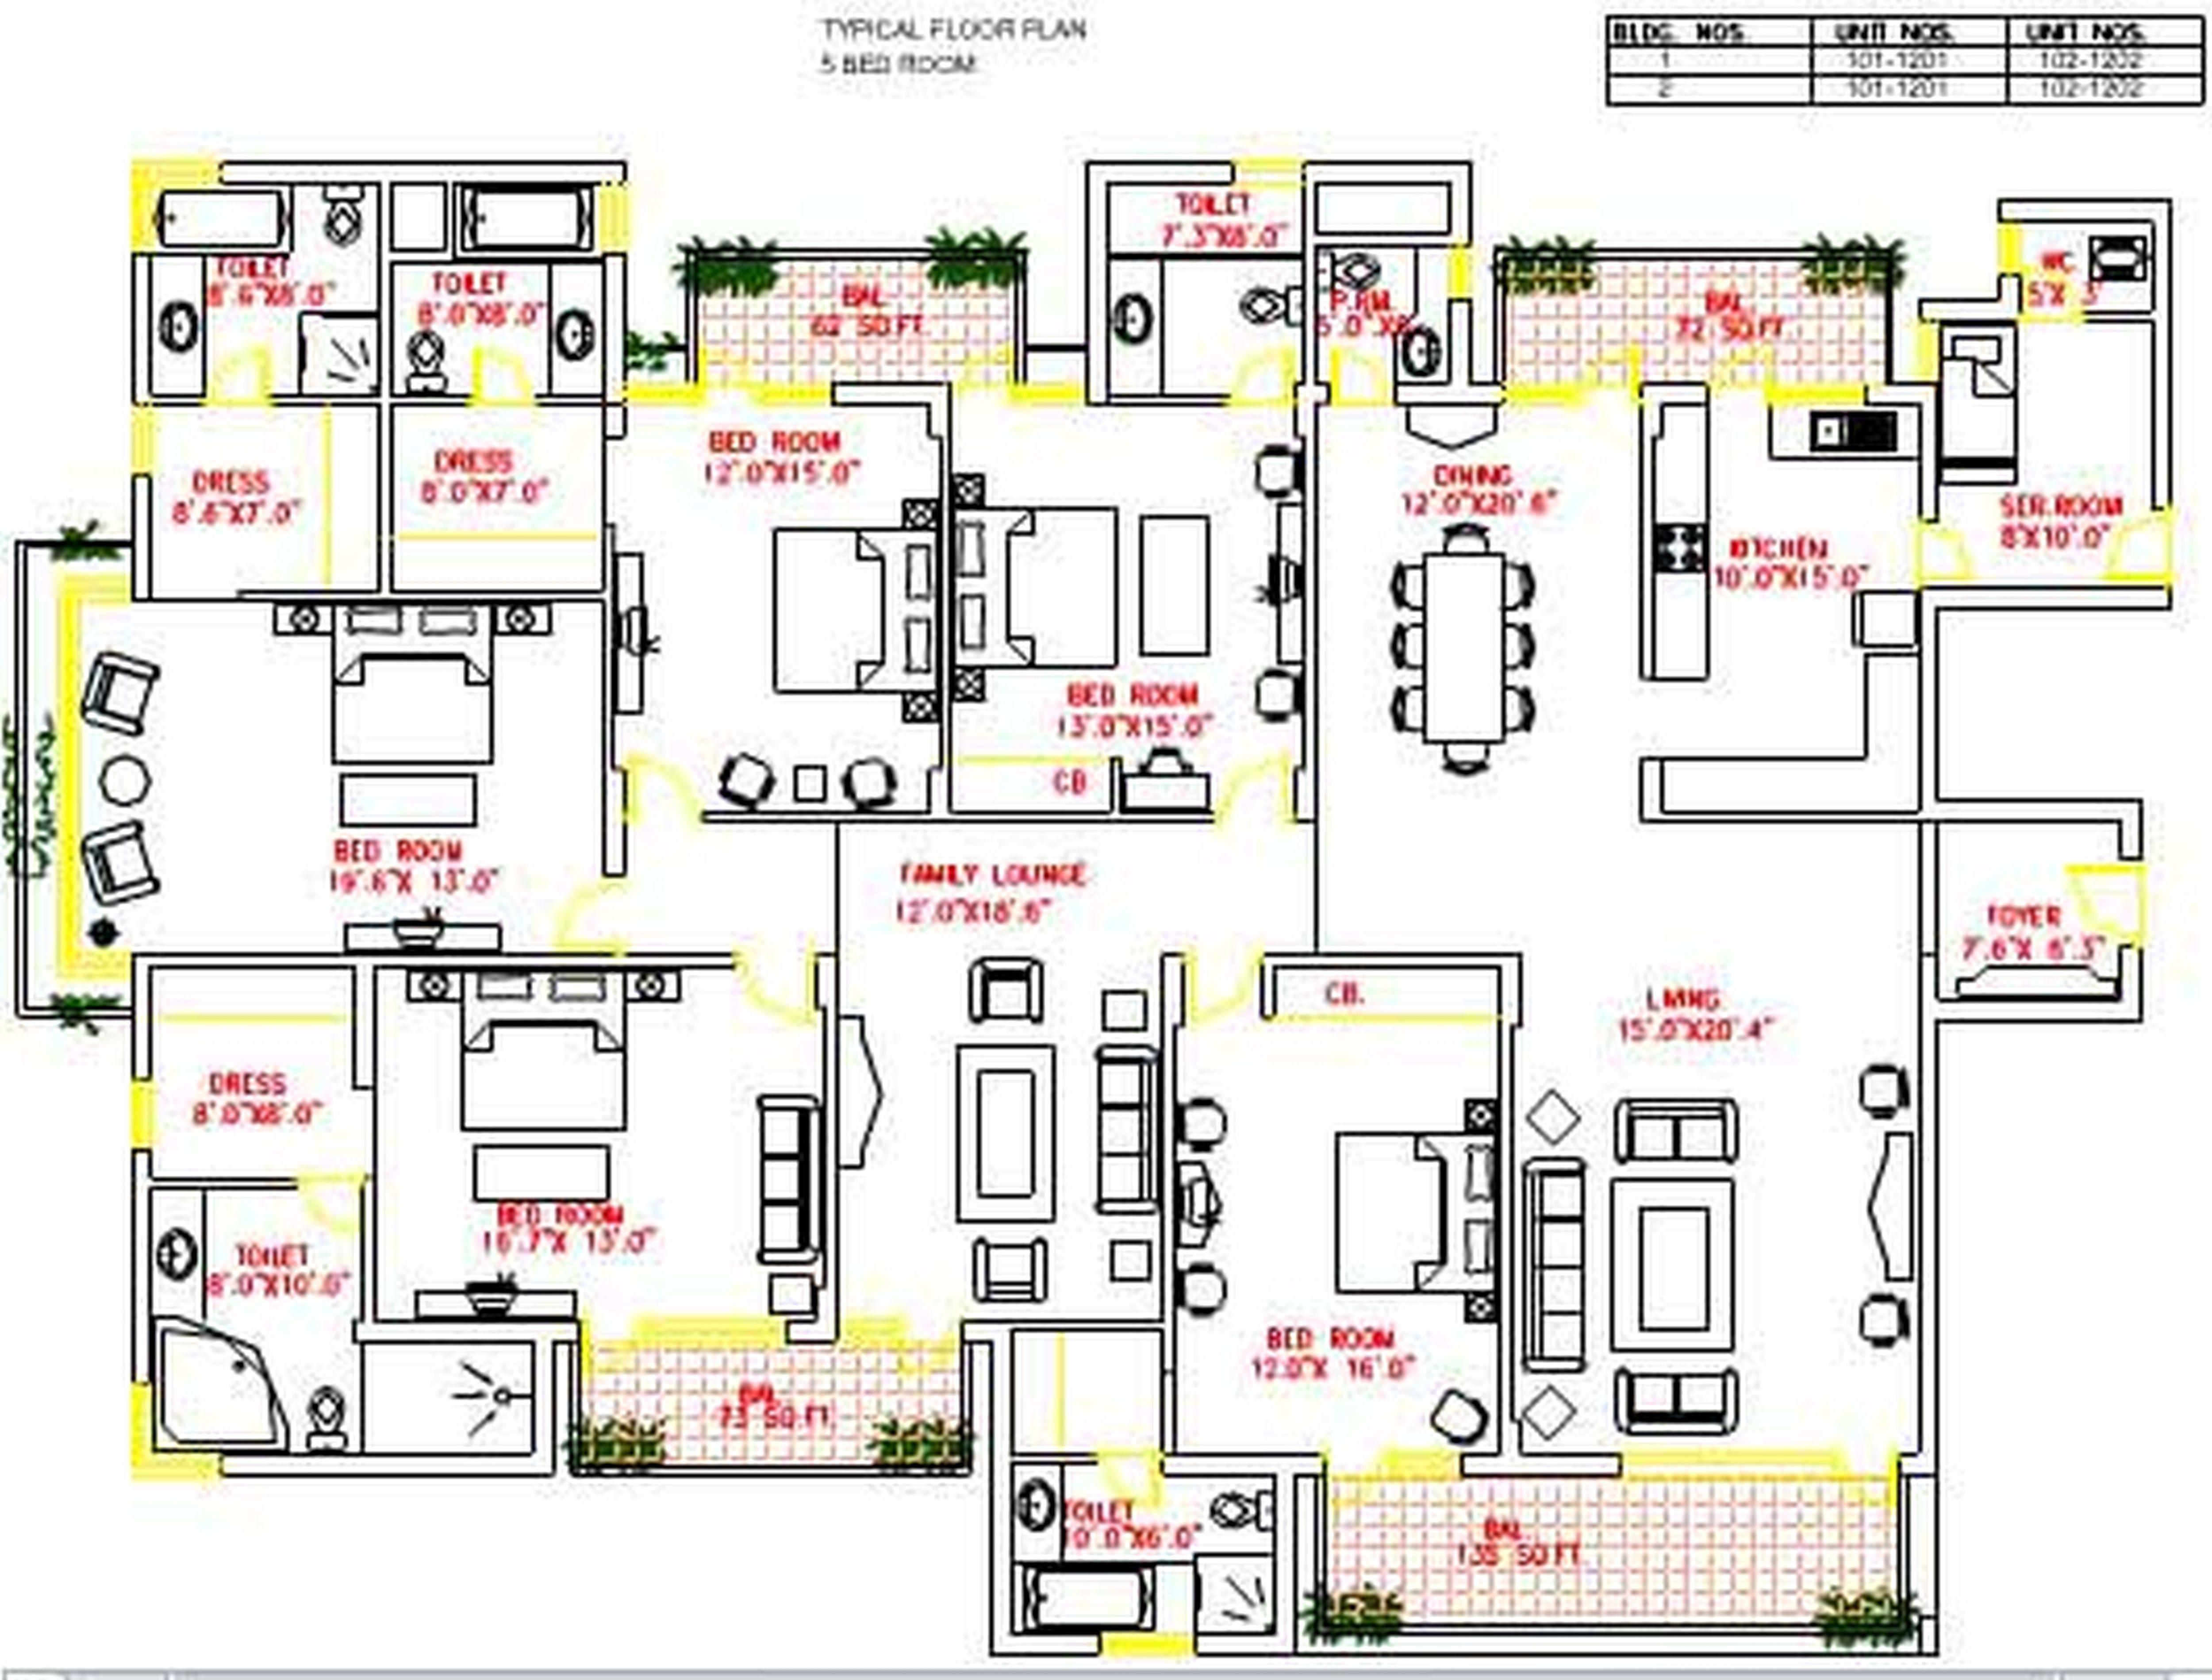 Bedroom clipart house blueprint #11